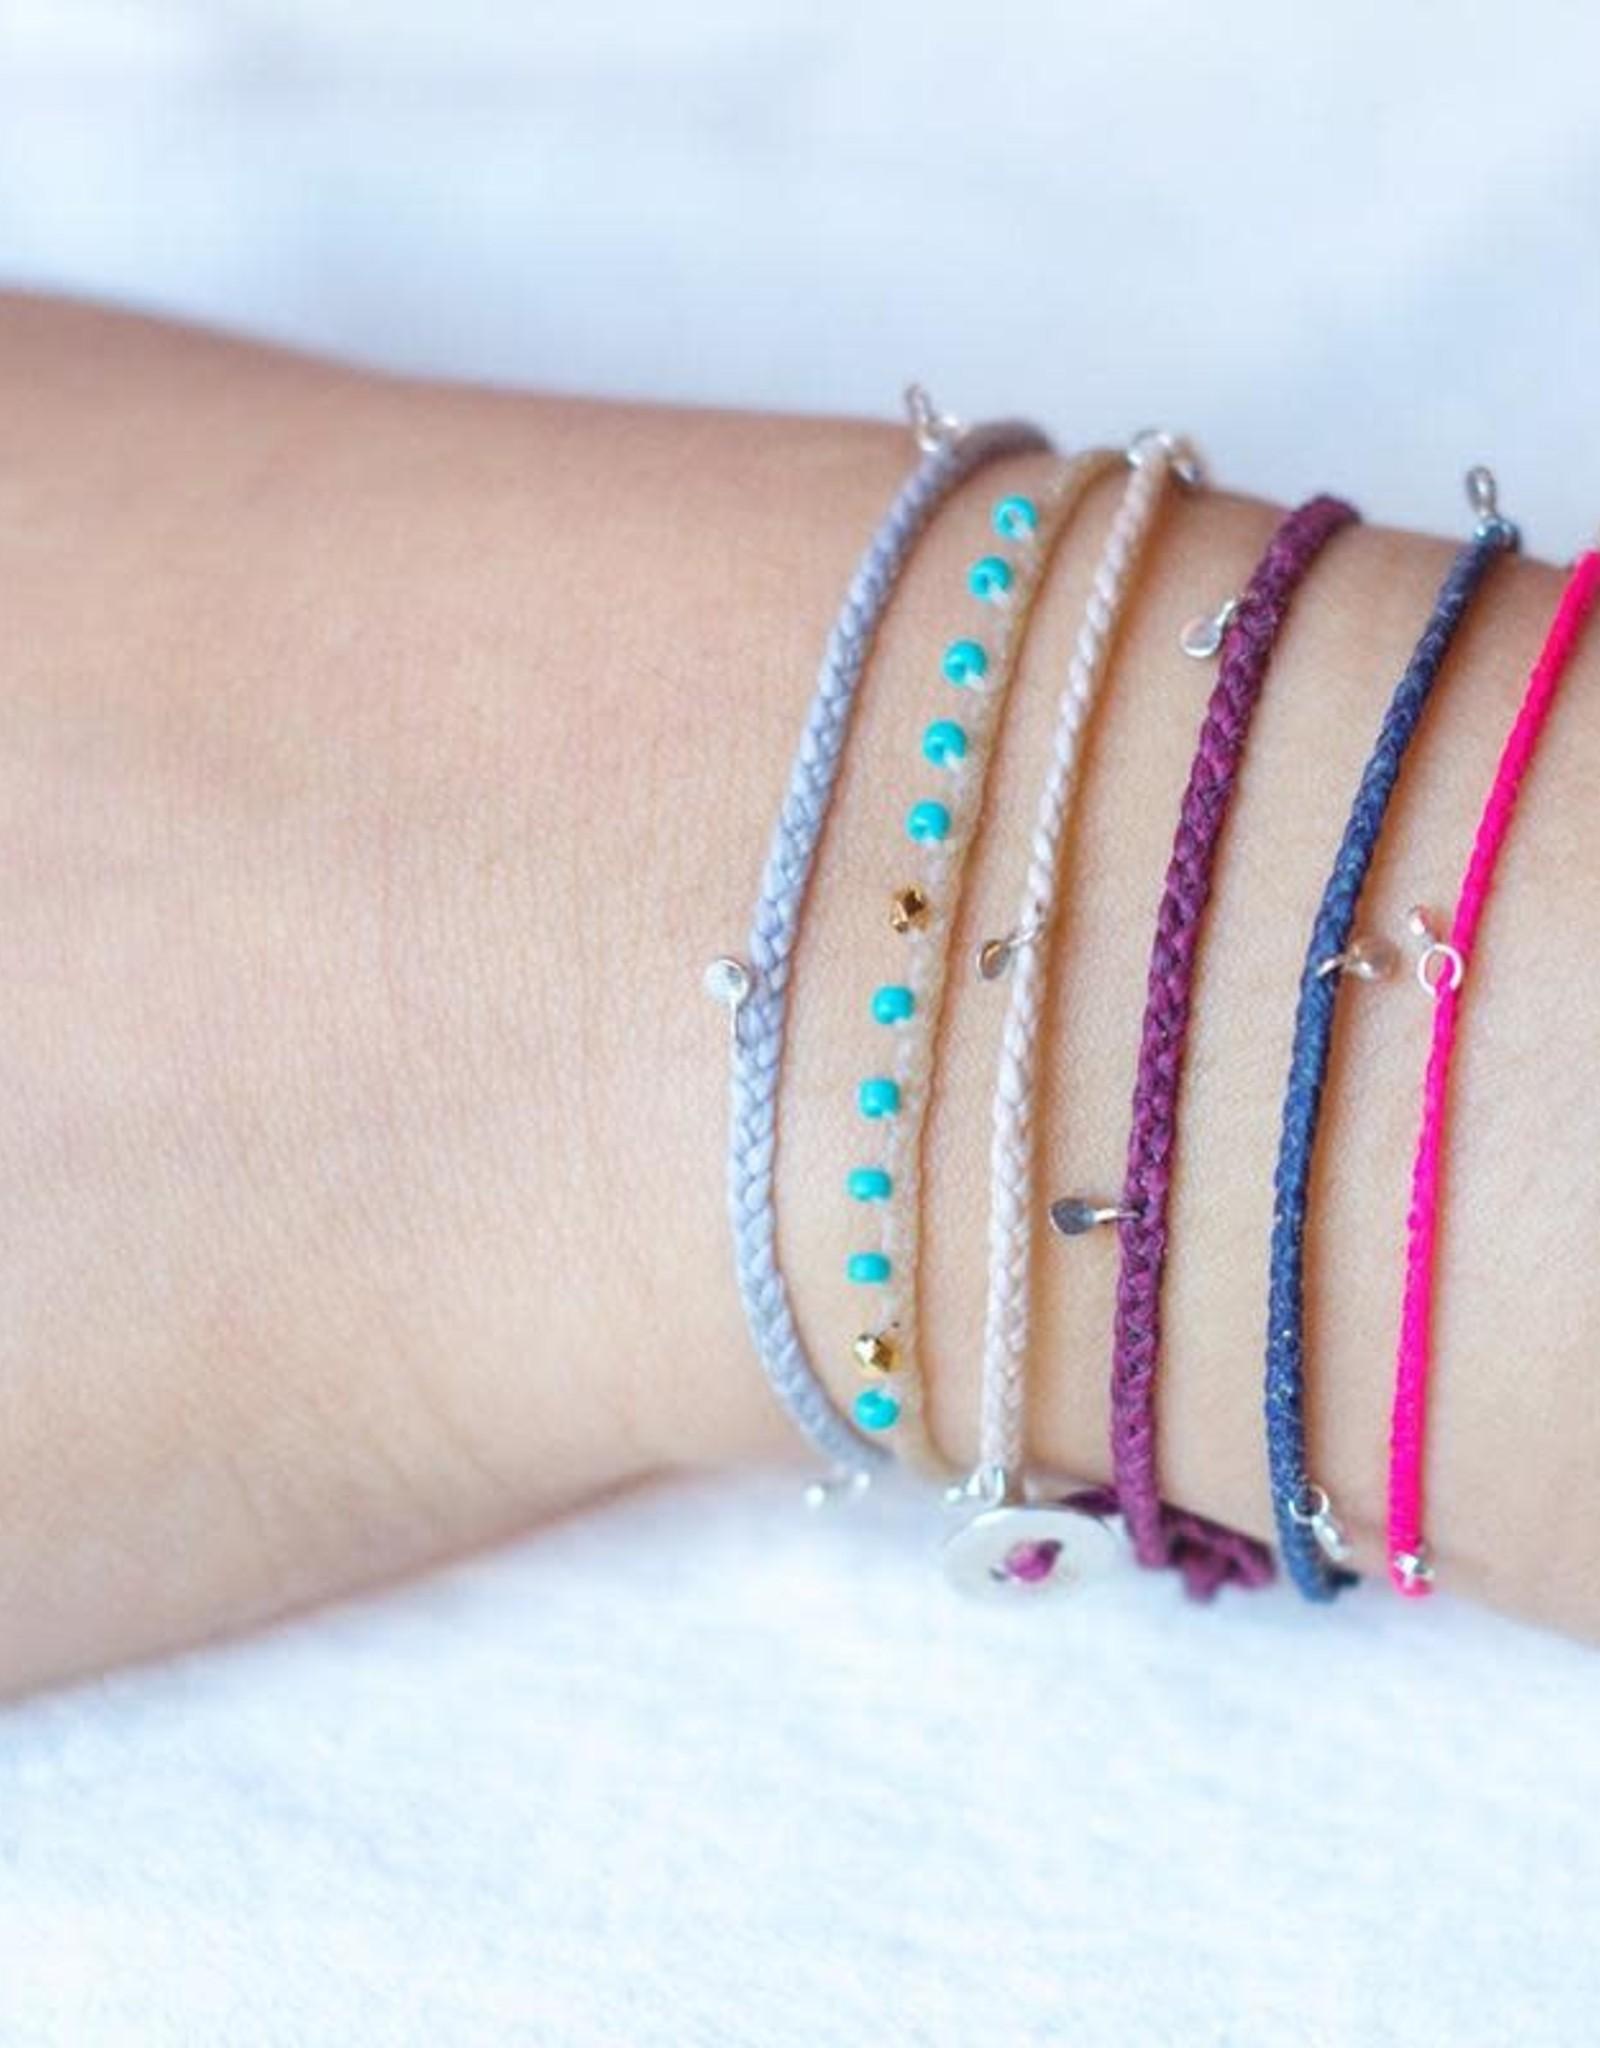 Scosha Fairy Bead Signature Silver Bracelet - Fuschia